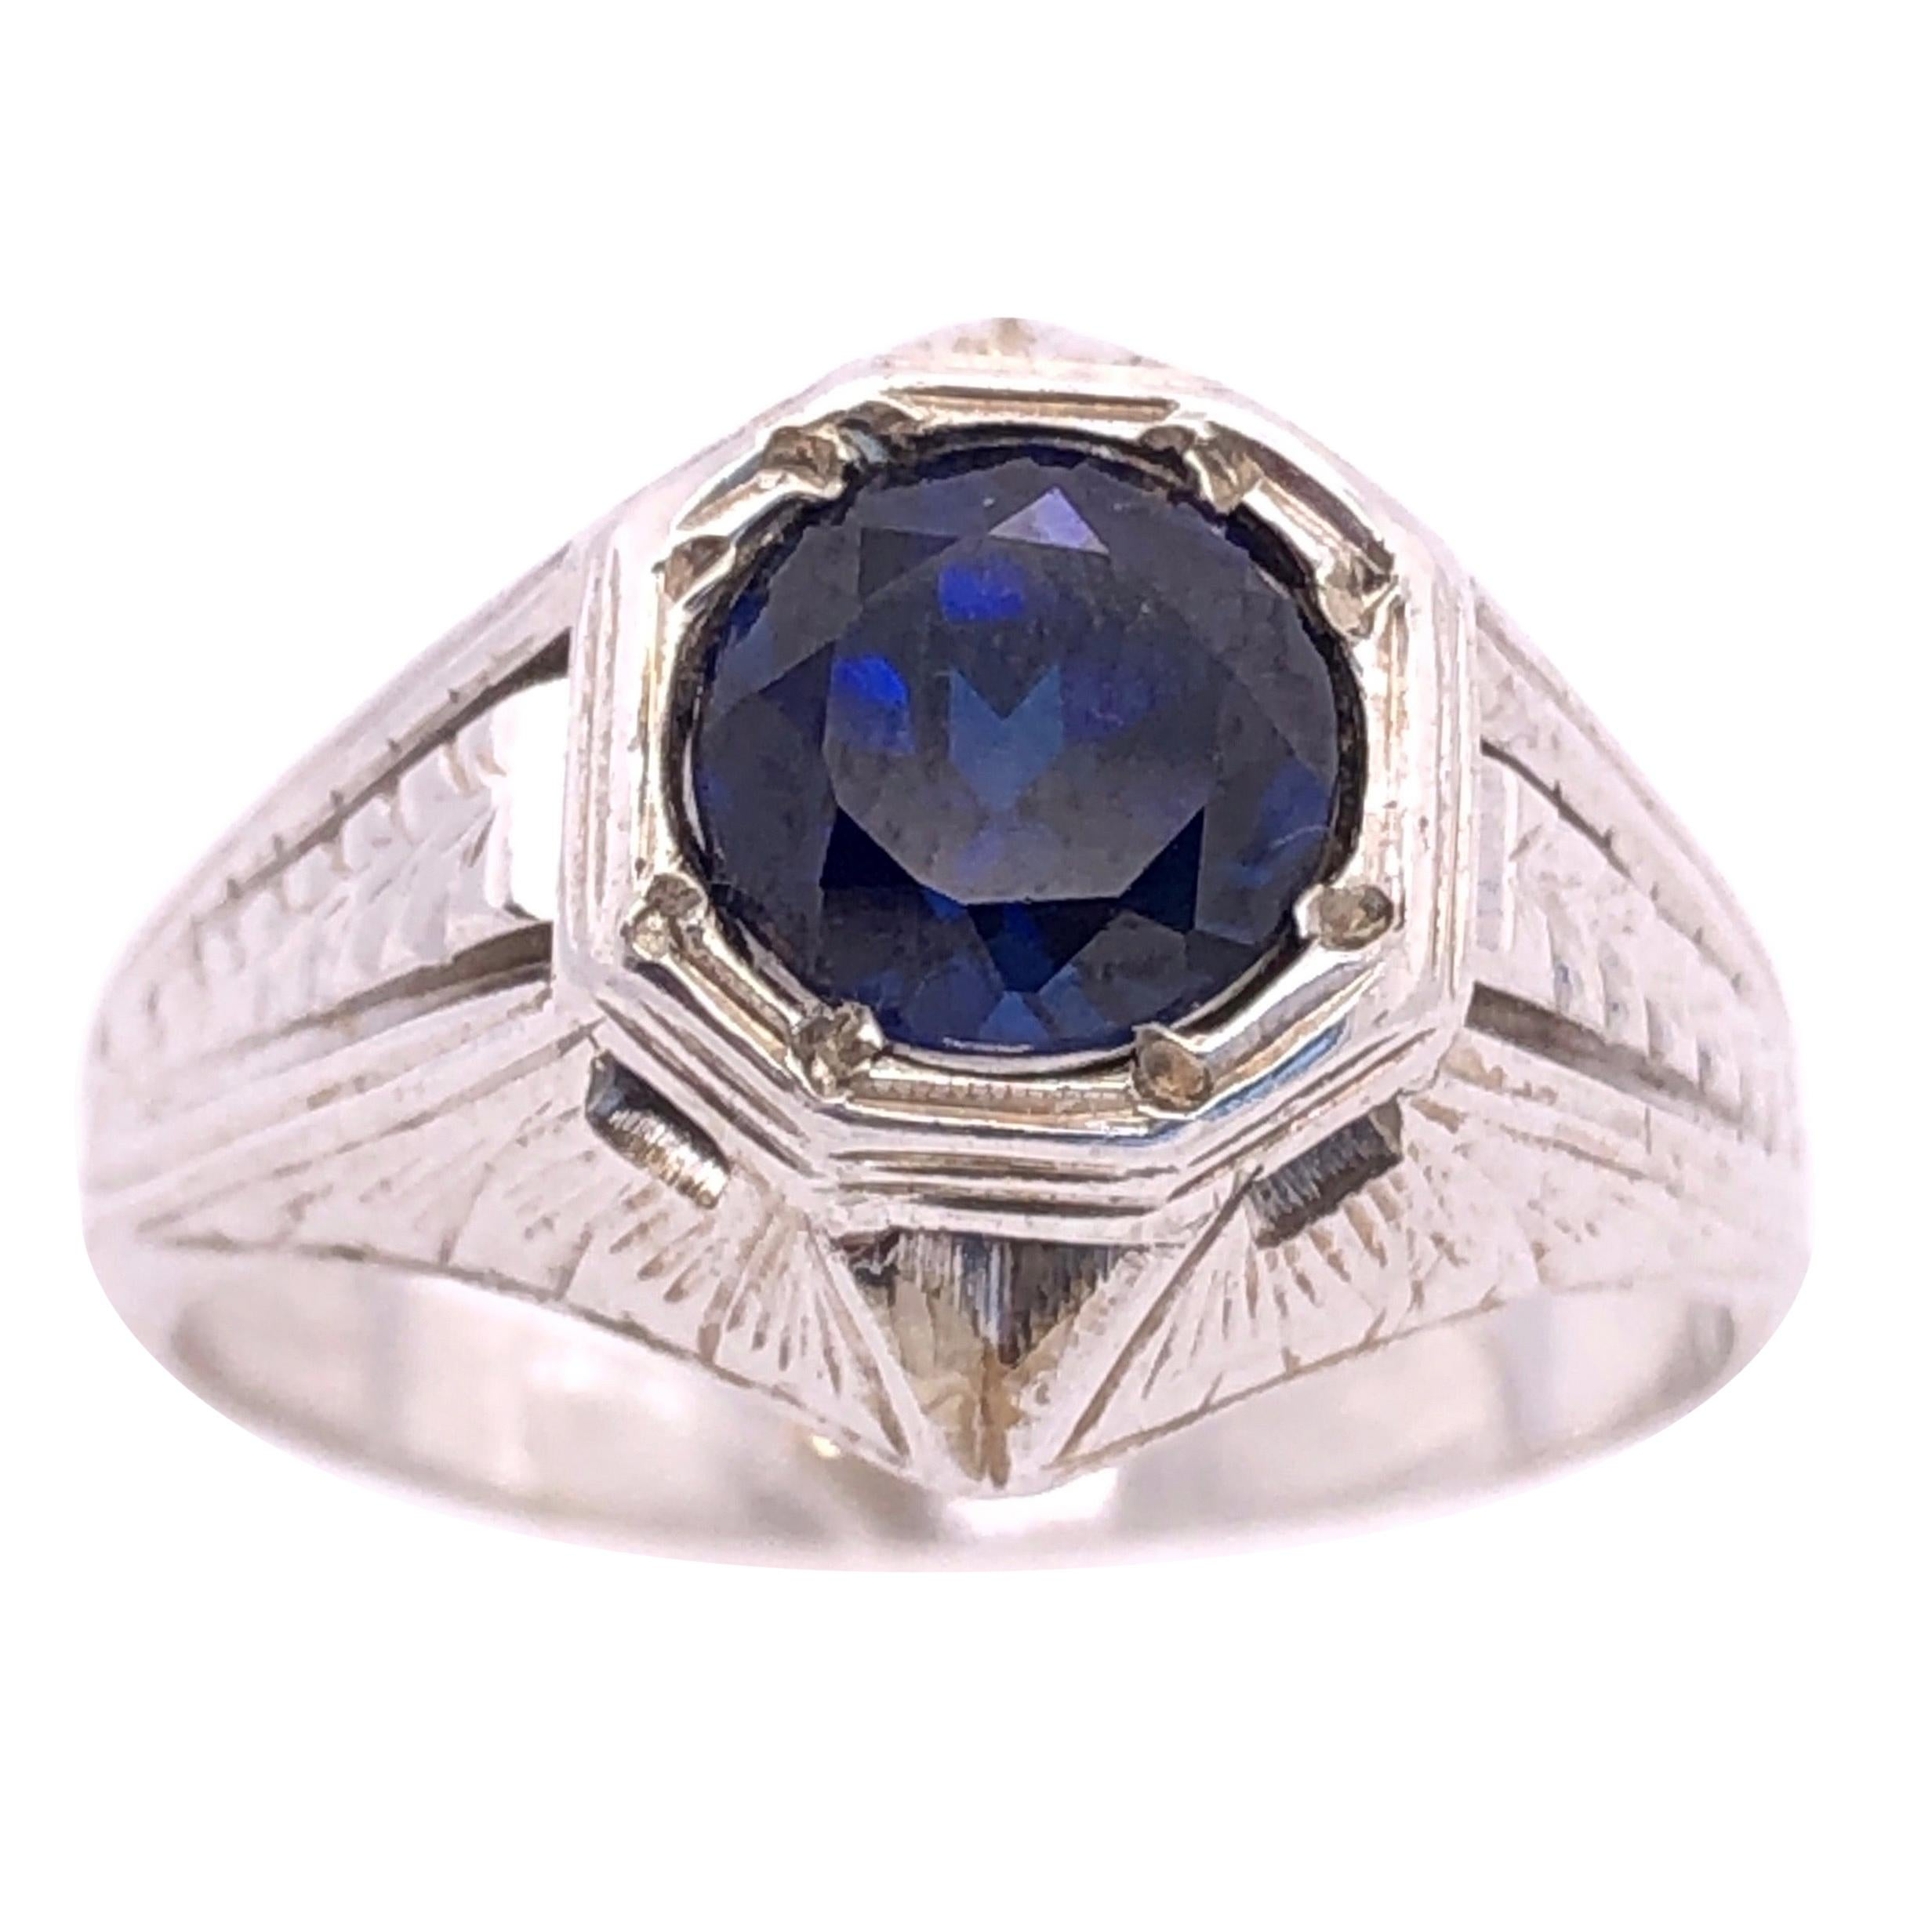 14 Karat White Gold Sapphire Solitaire Ring